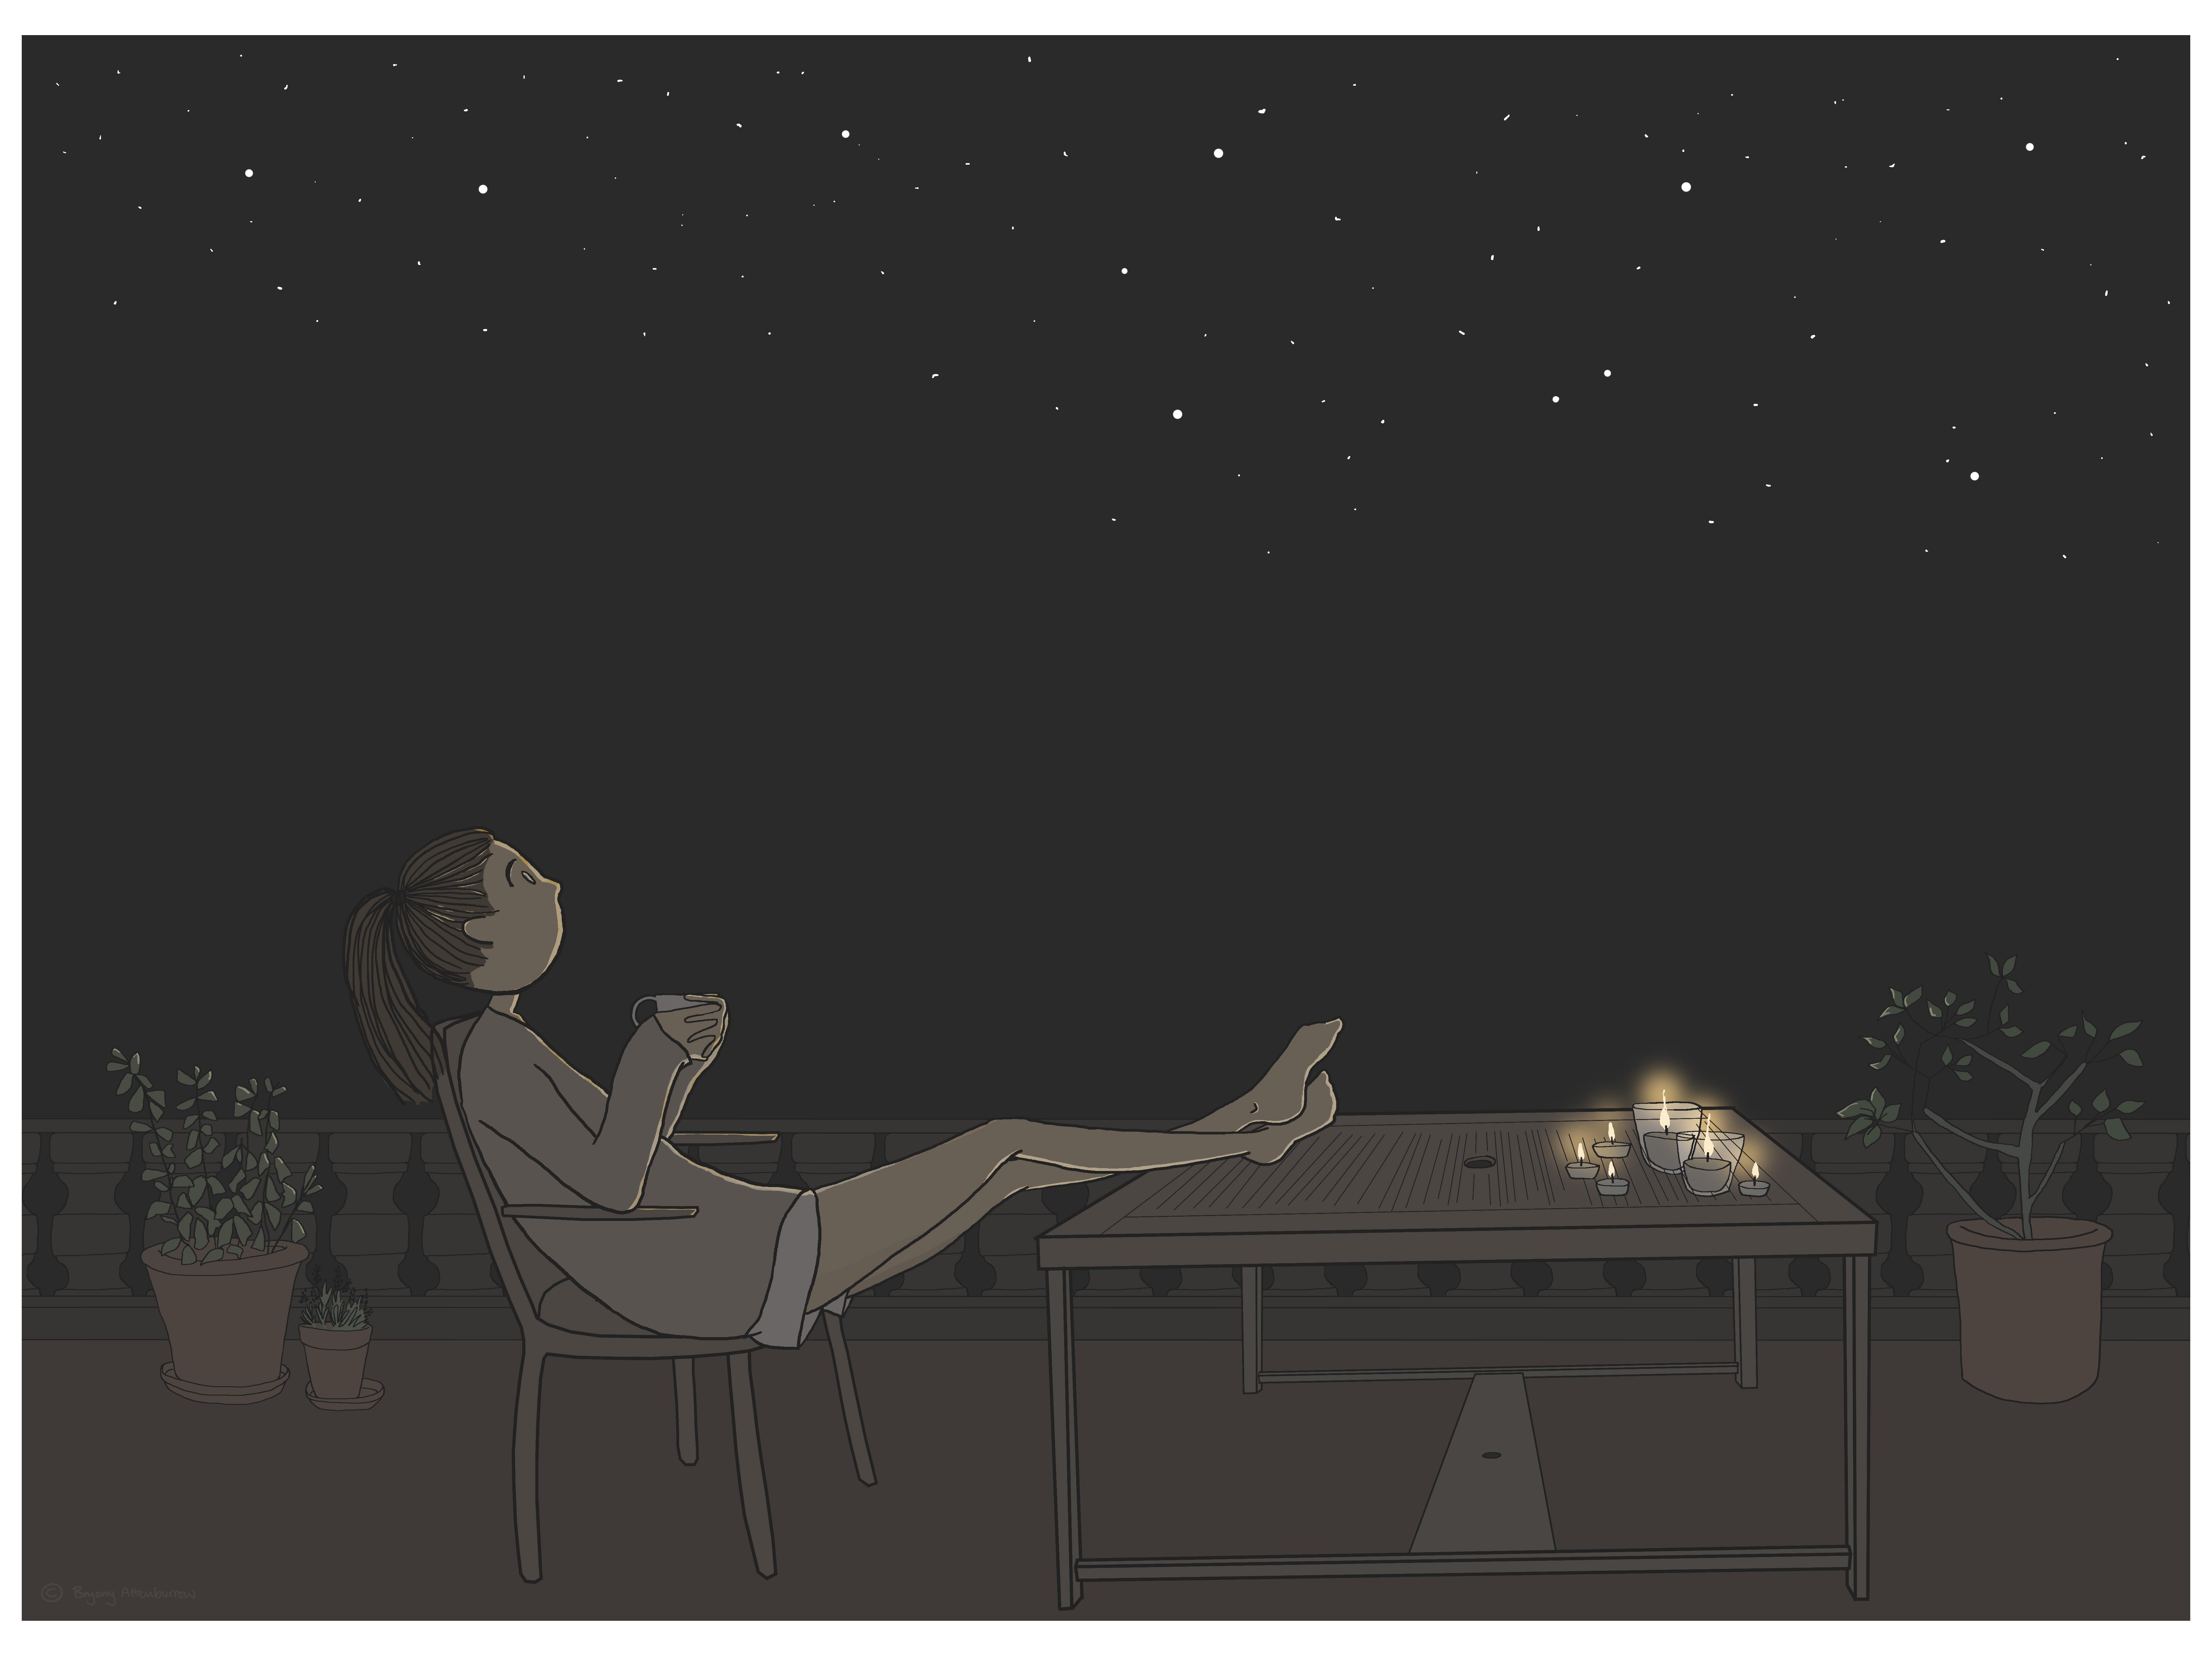 artwork - star gazing